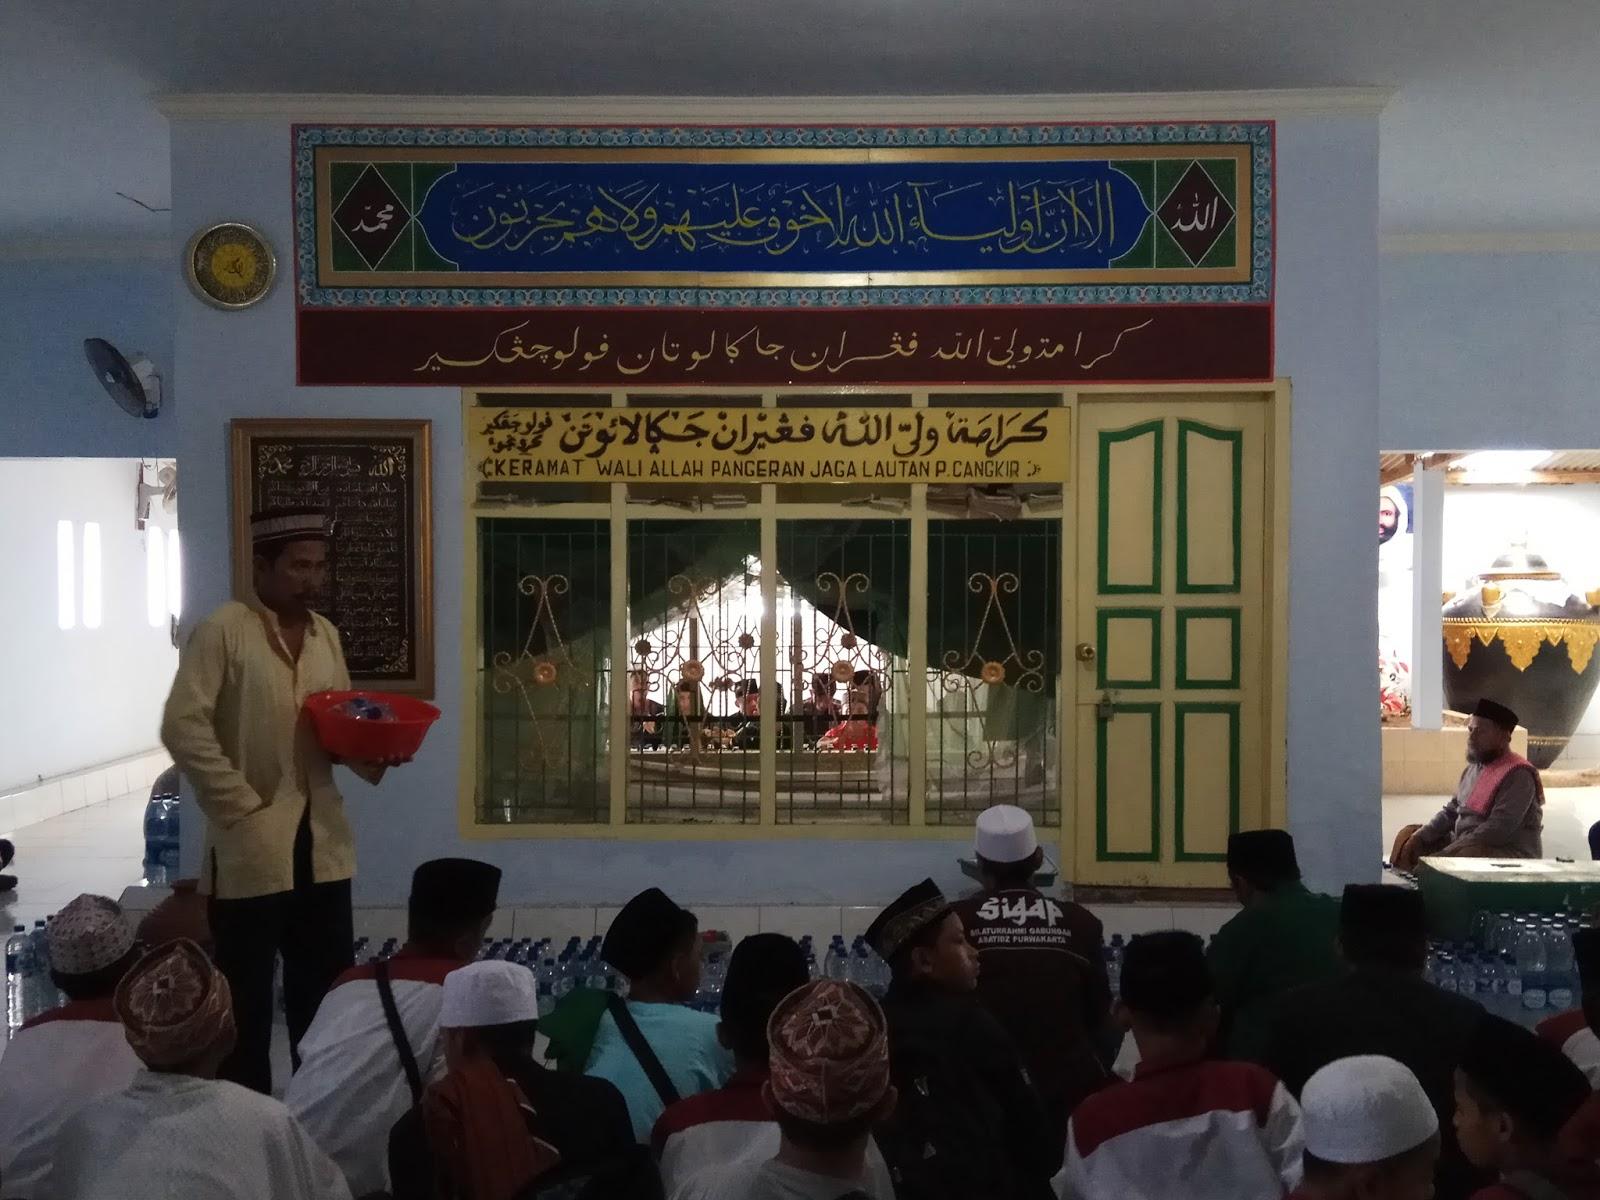 Syar Fud Wisata Pulau Cangkir Kronjo Tangerang Banten Terlatak Desa